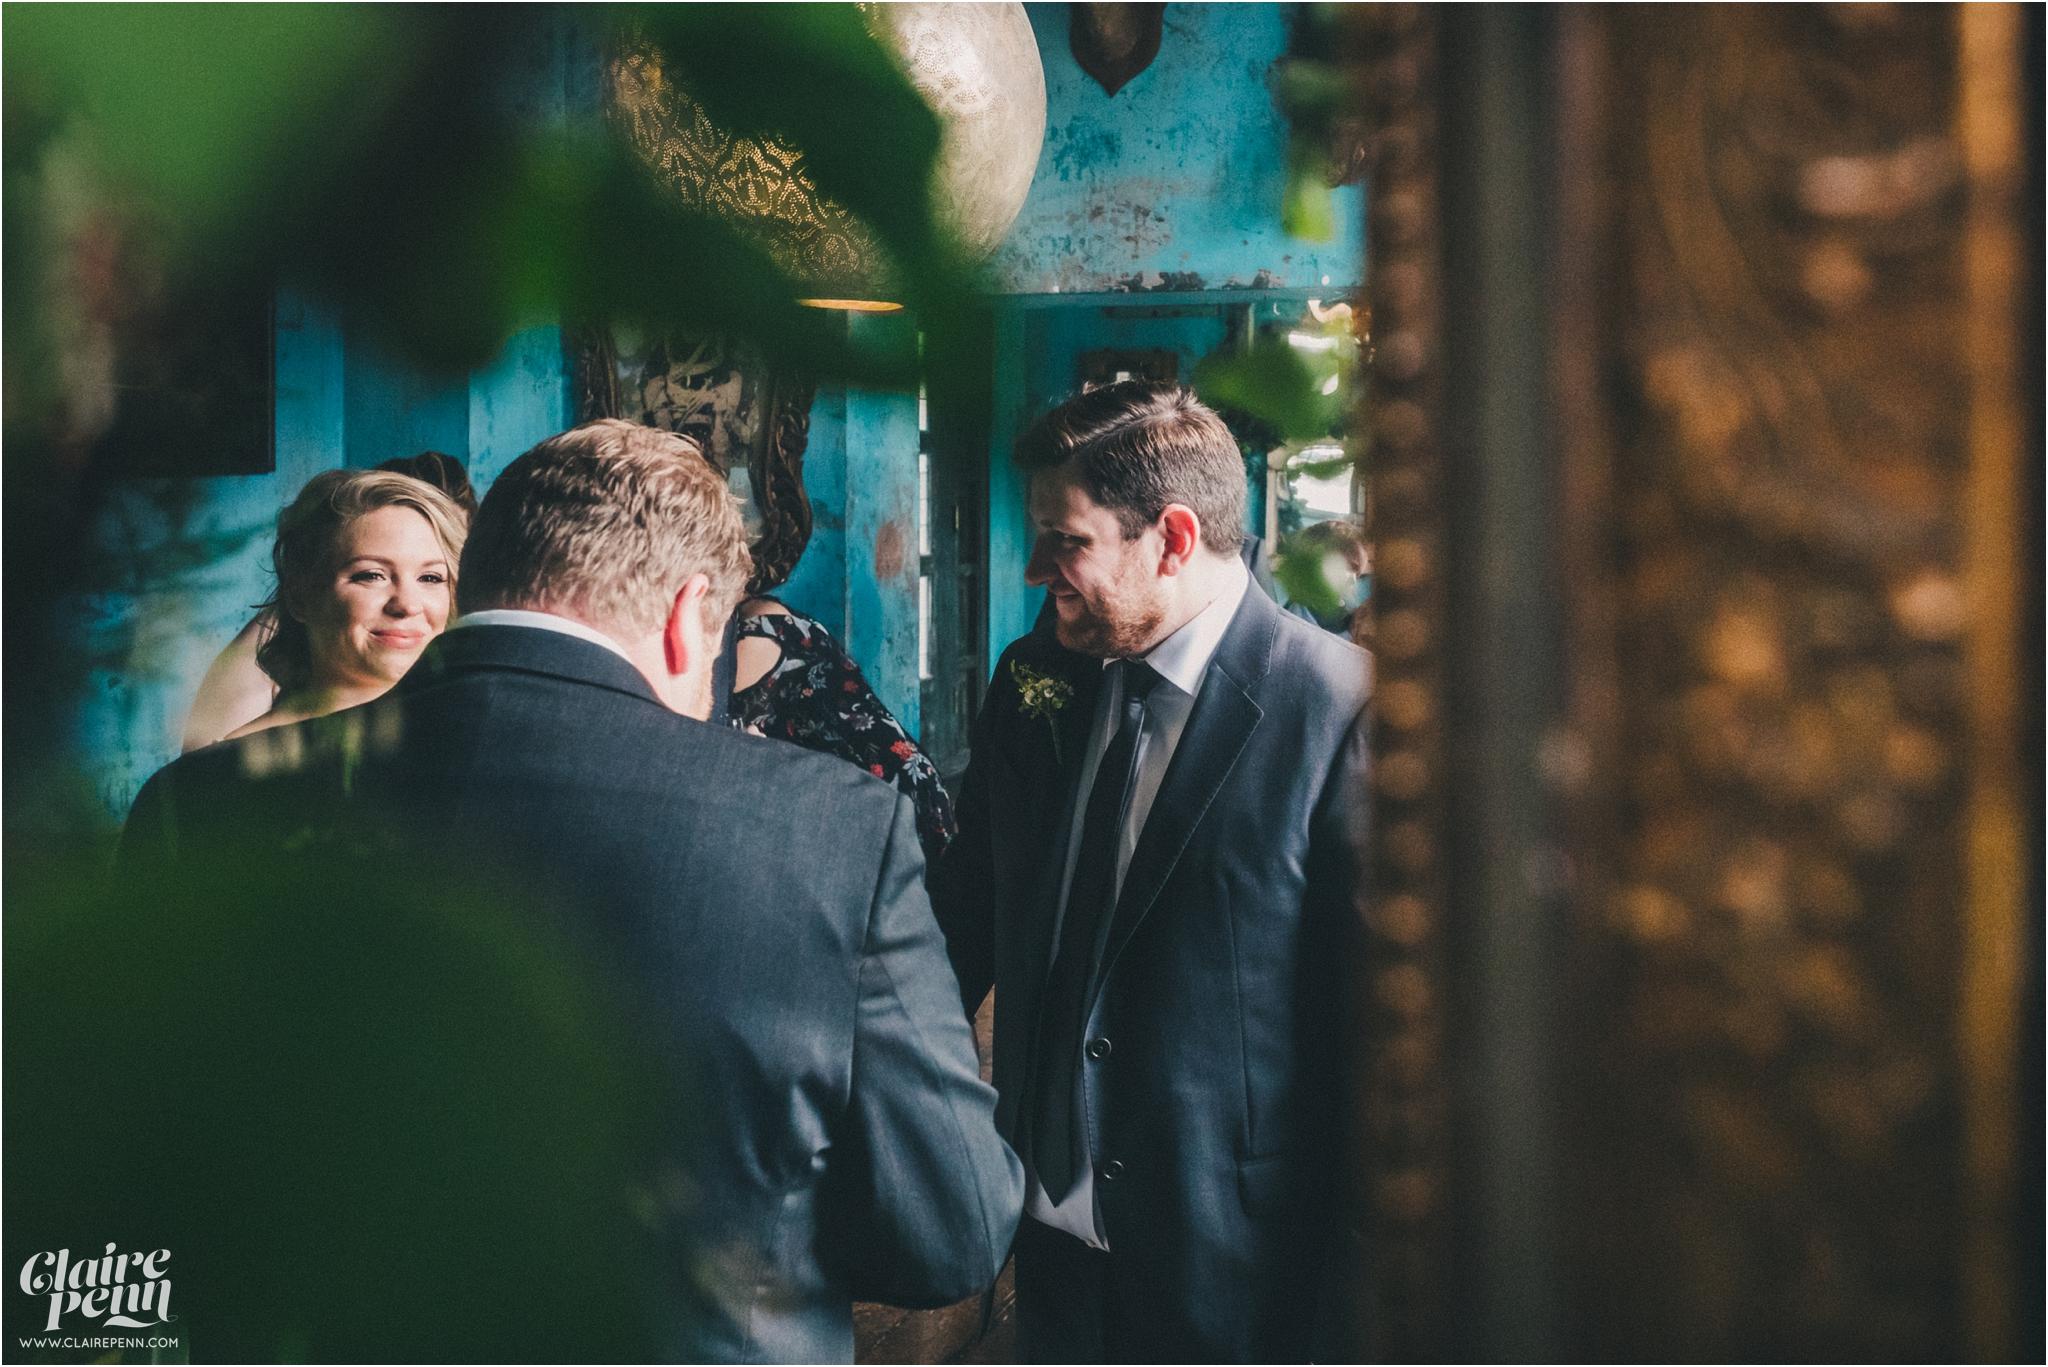 Paradise by way of Kensall Green London pub intimate wedding_0027.jpg